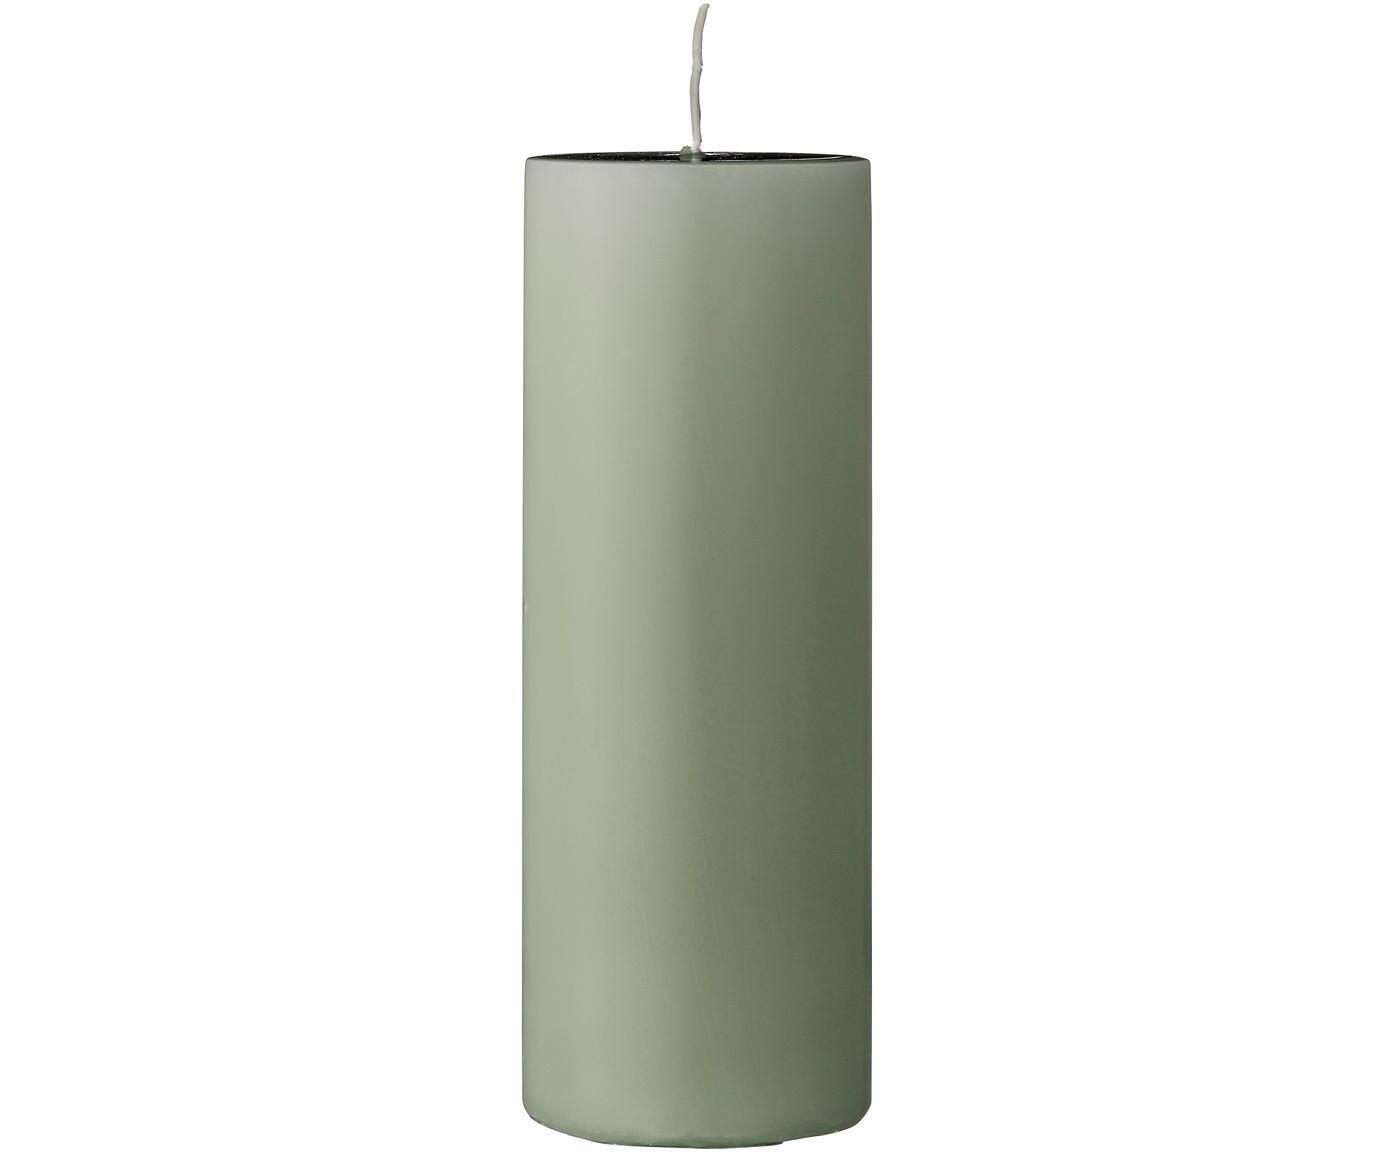 Stompkaars Lulu, Was, Lichtgroen, Ø 7 cm